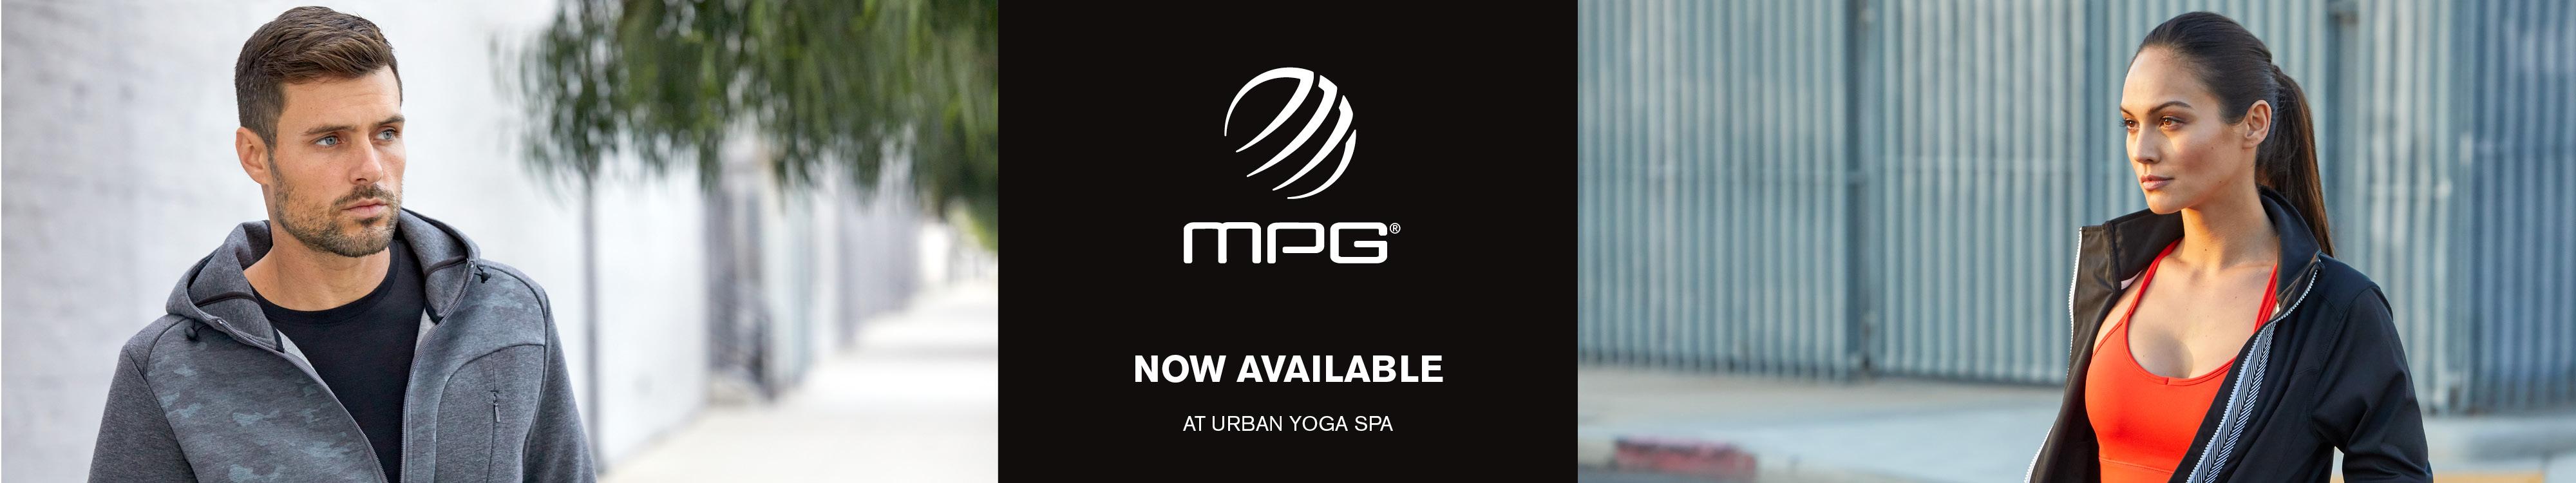 MPG-UYS-Web-Banner-1920x360-v2-2